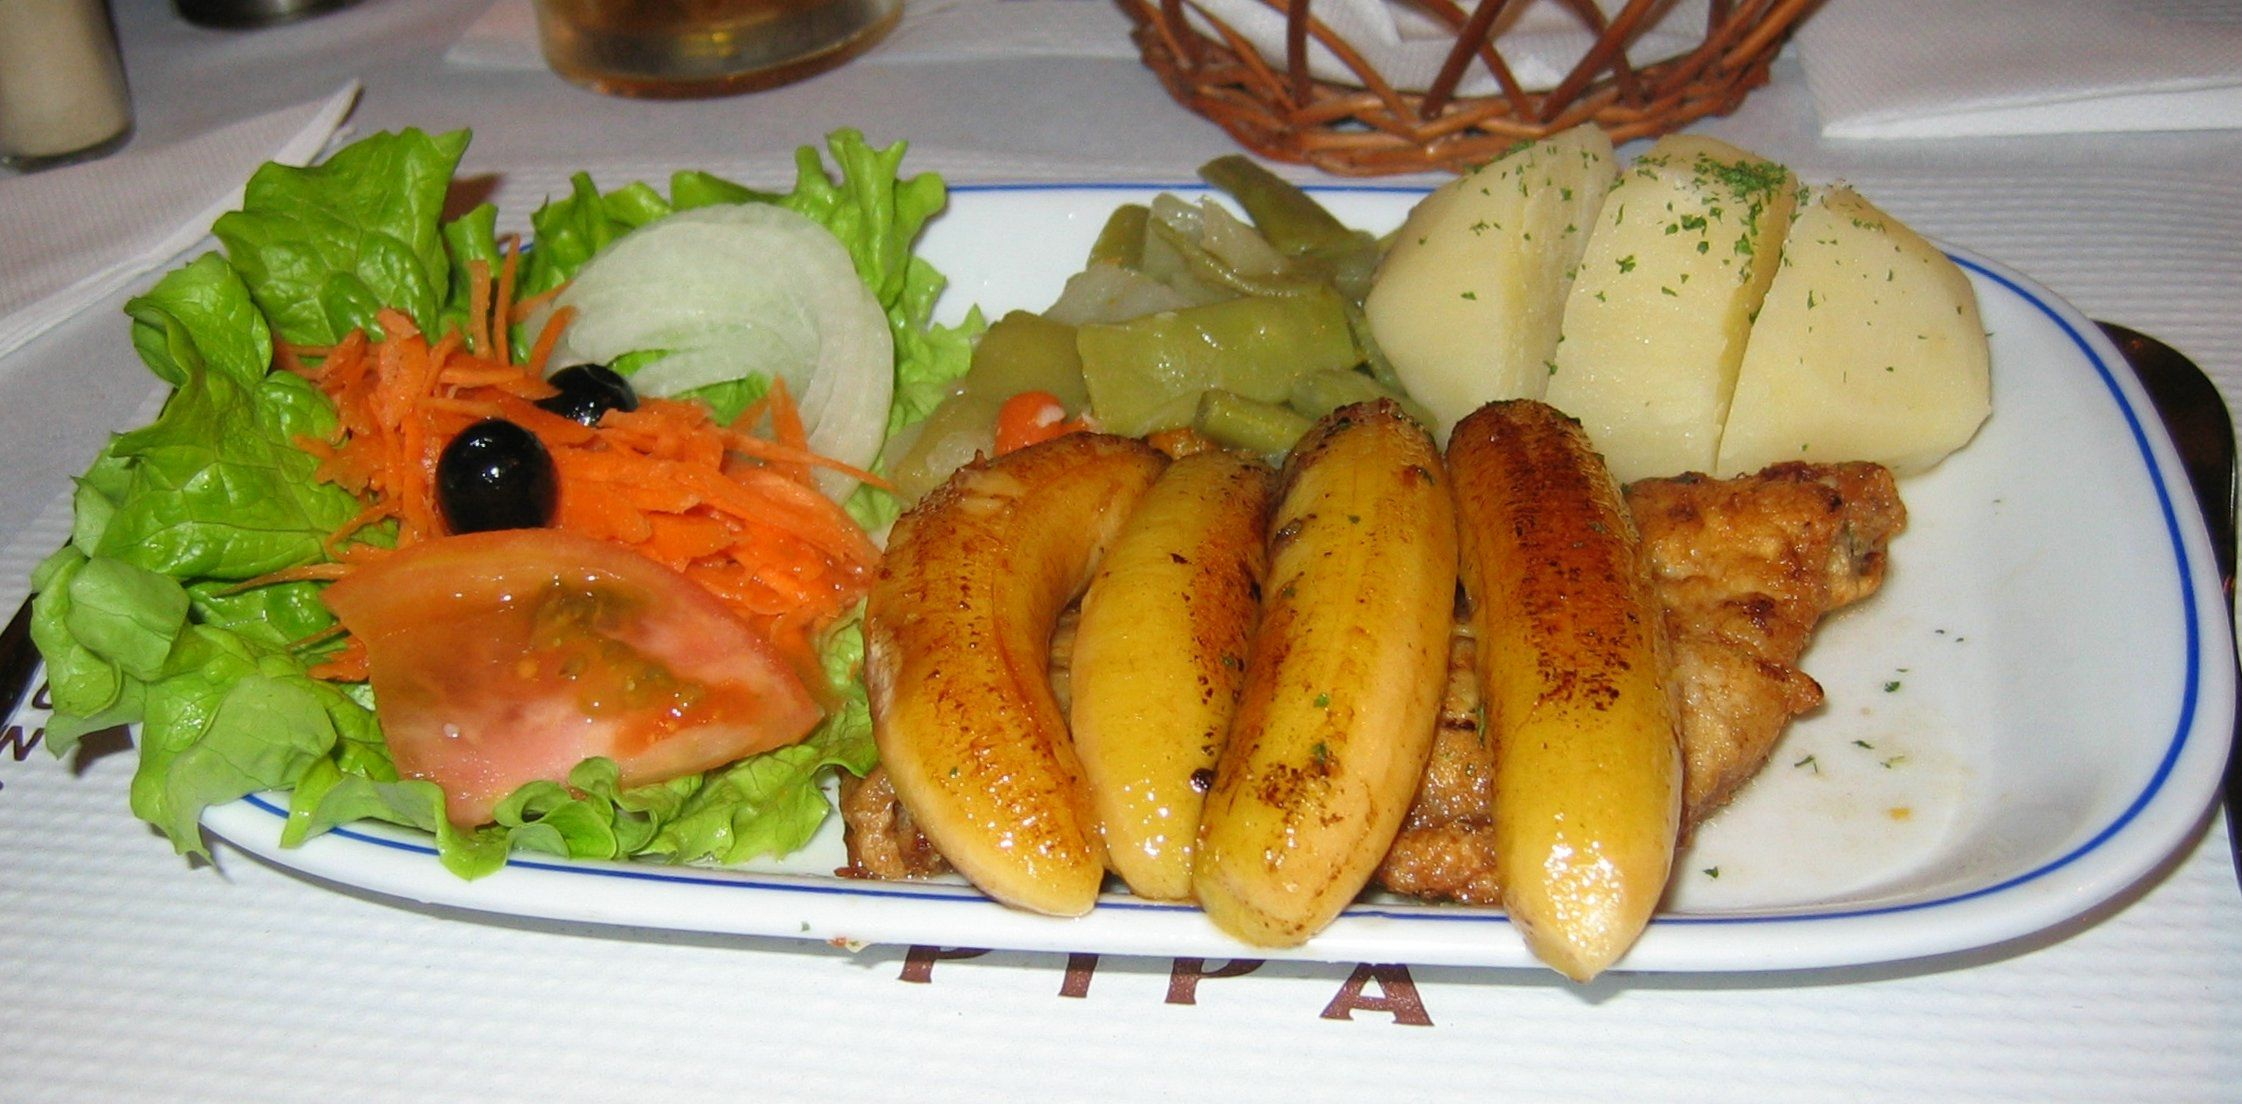 Espada Com Banana Black Scabbard Fish With Banana Madeira Secretmadeira Madeira Food Food And Drink Food